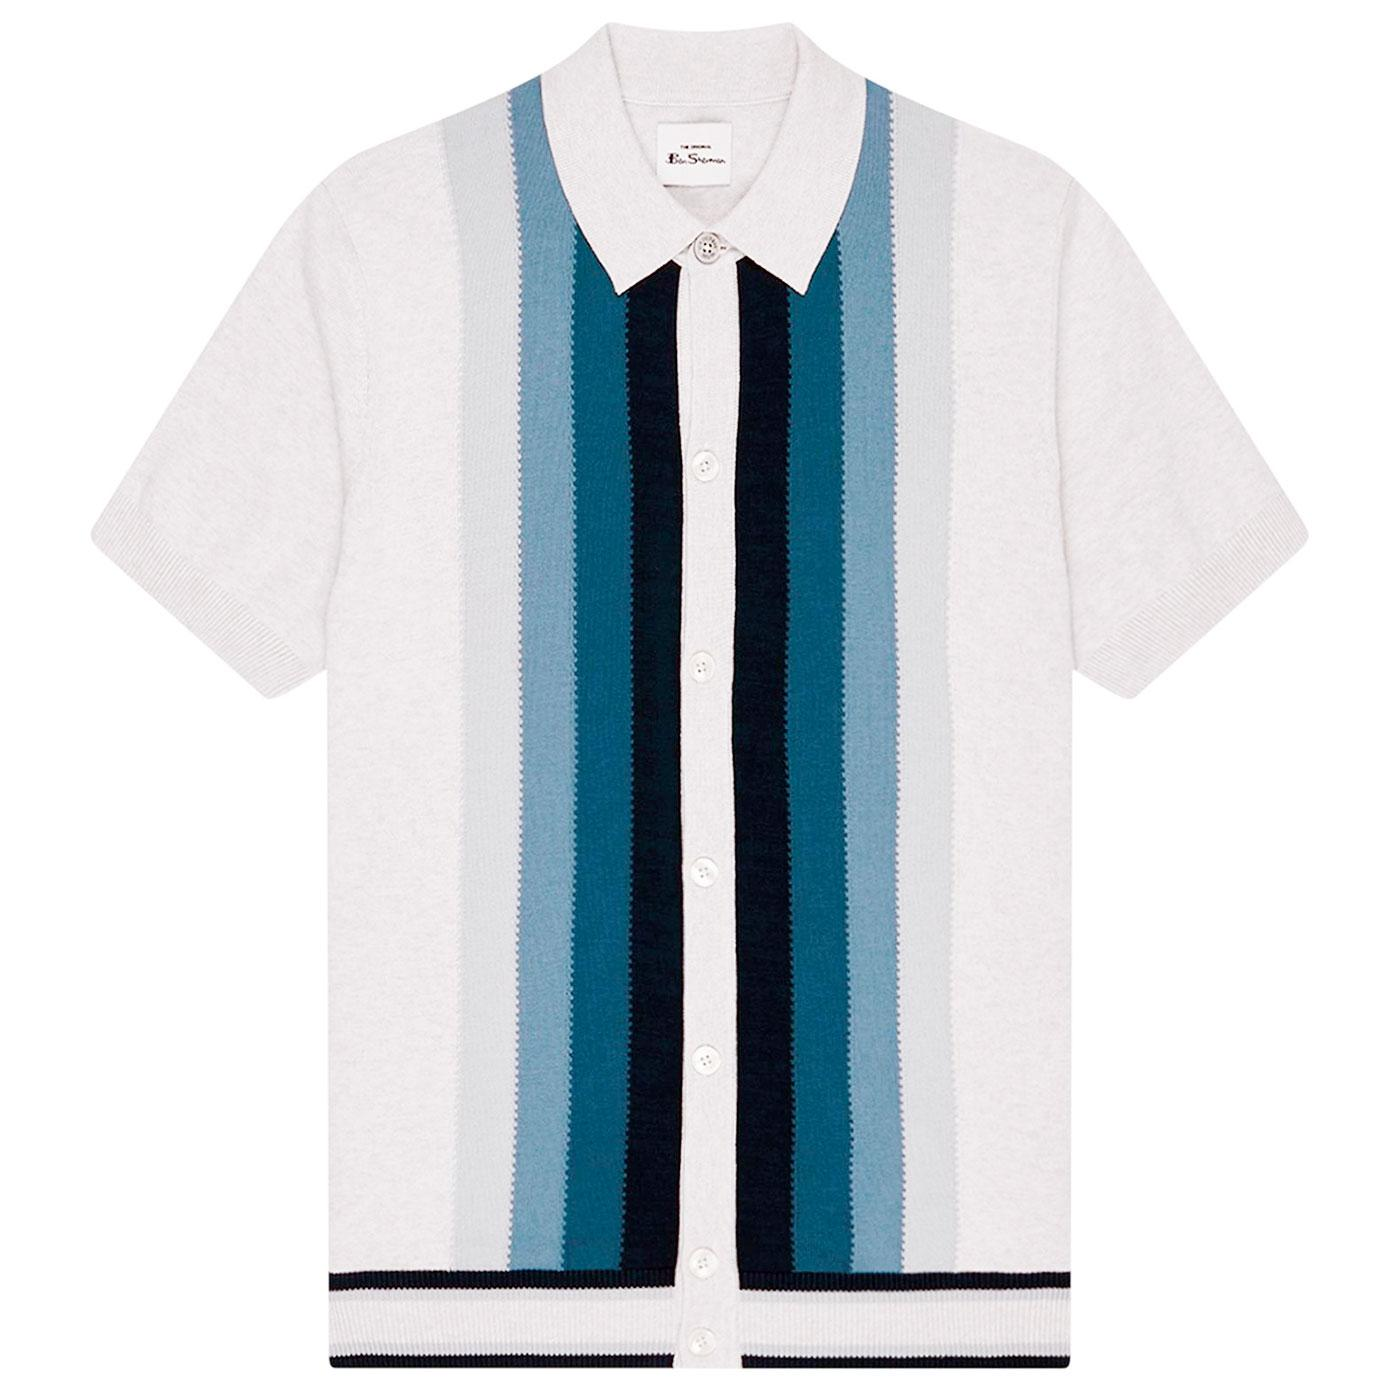 BEN SHERMAN Retro 60s Mod Gradient Polo Cardigan I